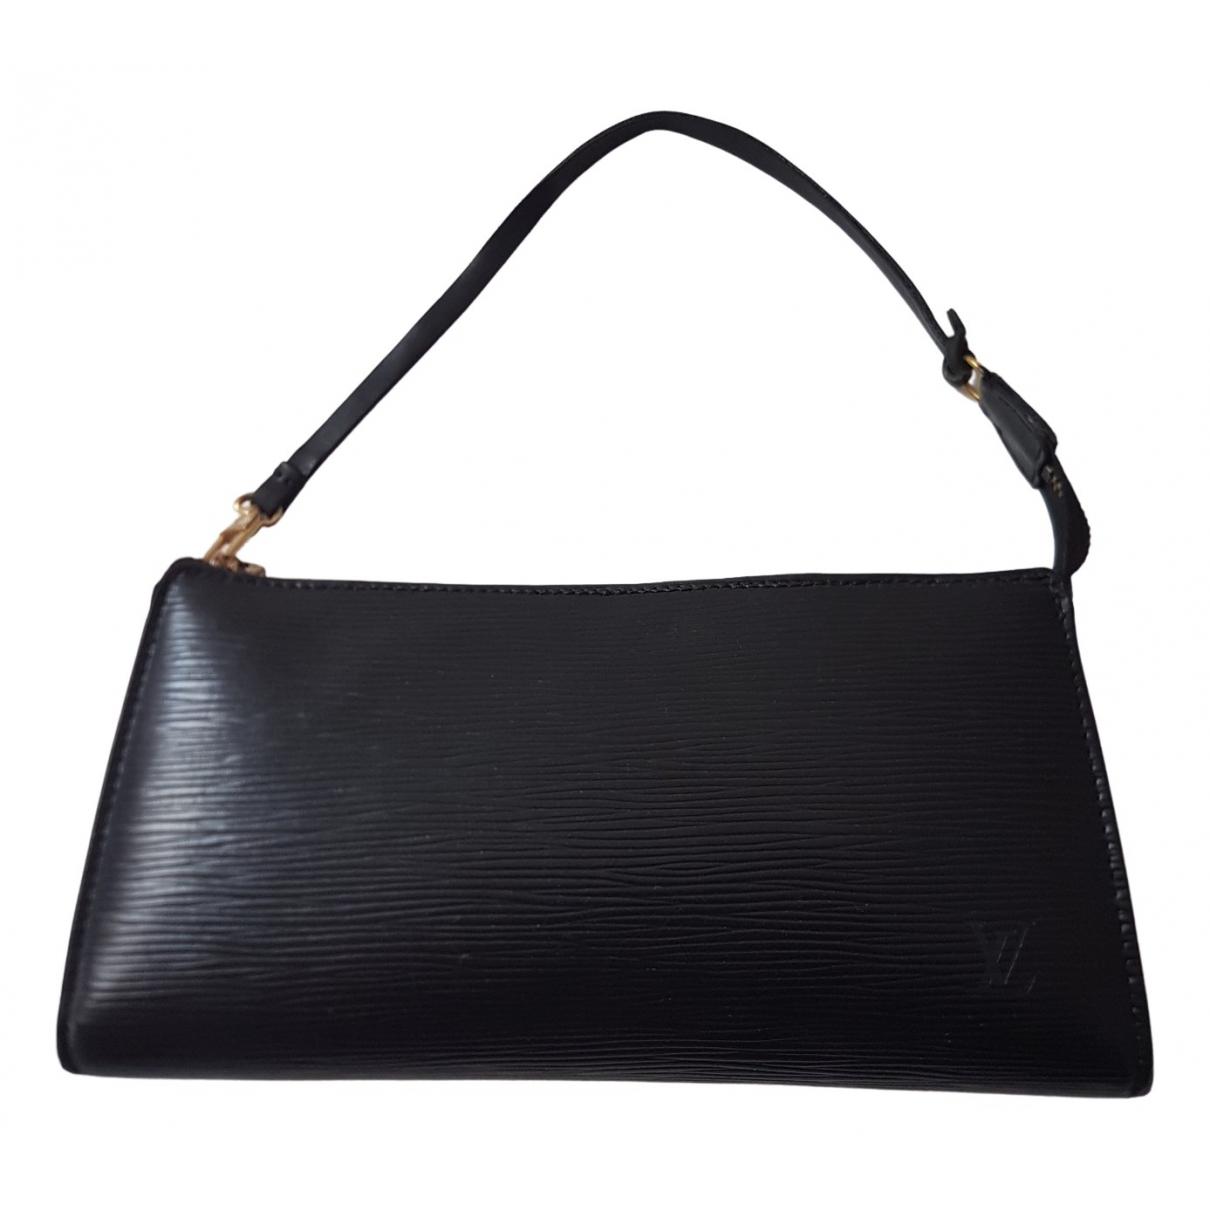 Louis Vuitton Pochette Accessoire Clutch in  Schwarz Leder